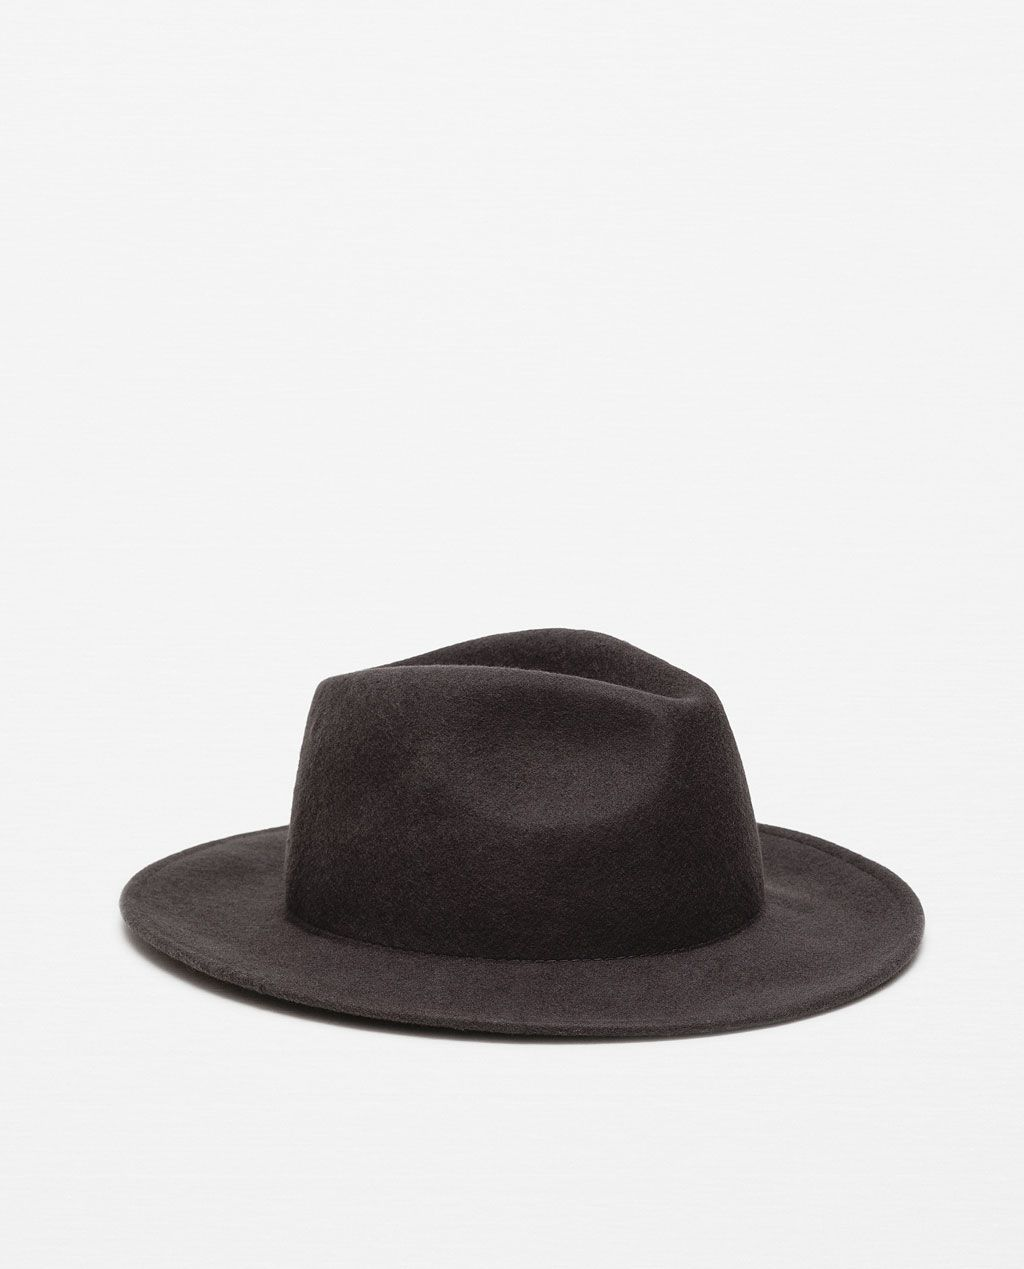 a7e5fb0143f46 Image 1 of WIDE BRIM FELT HAT from Zara